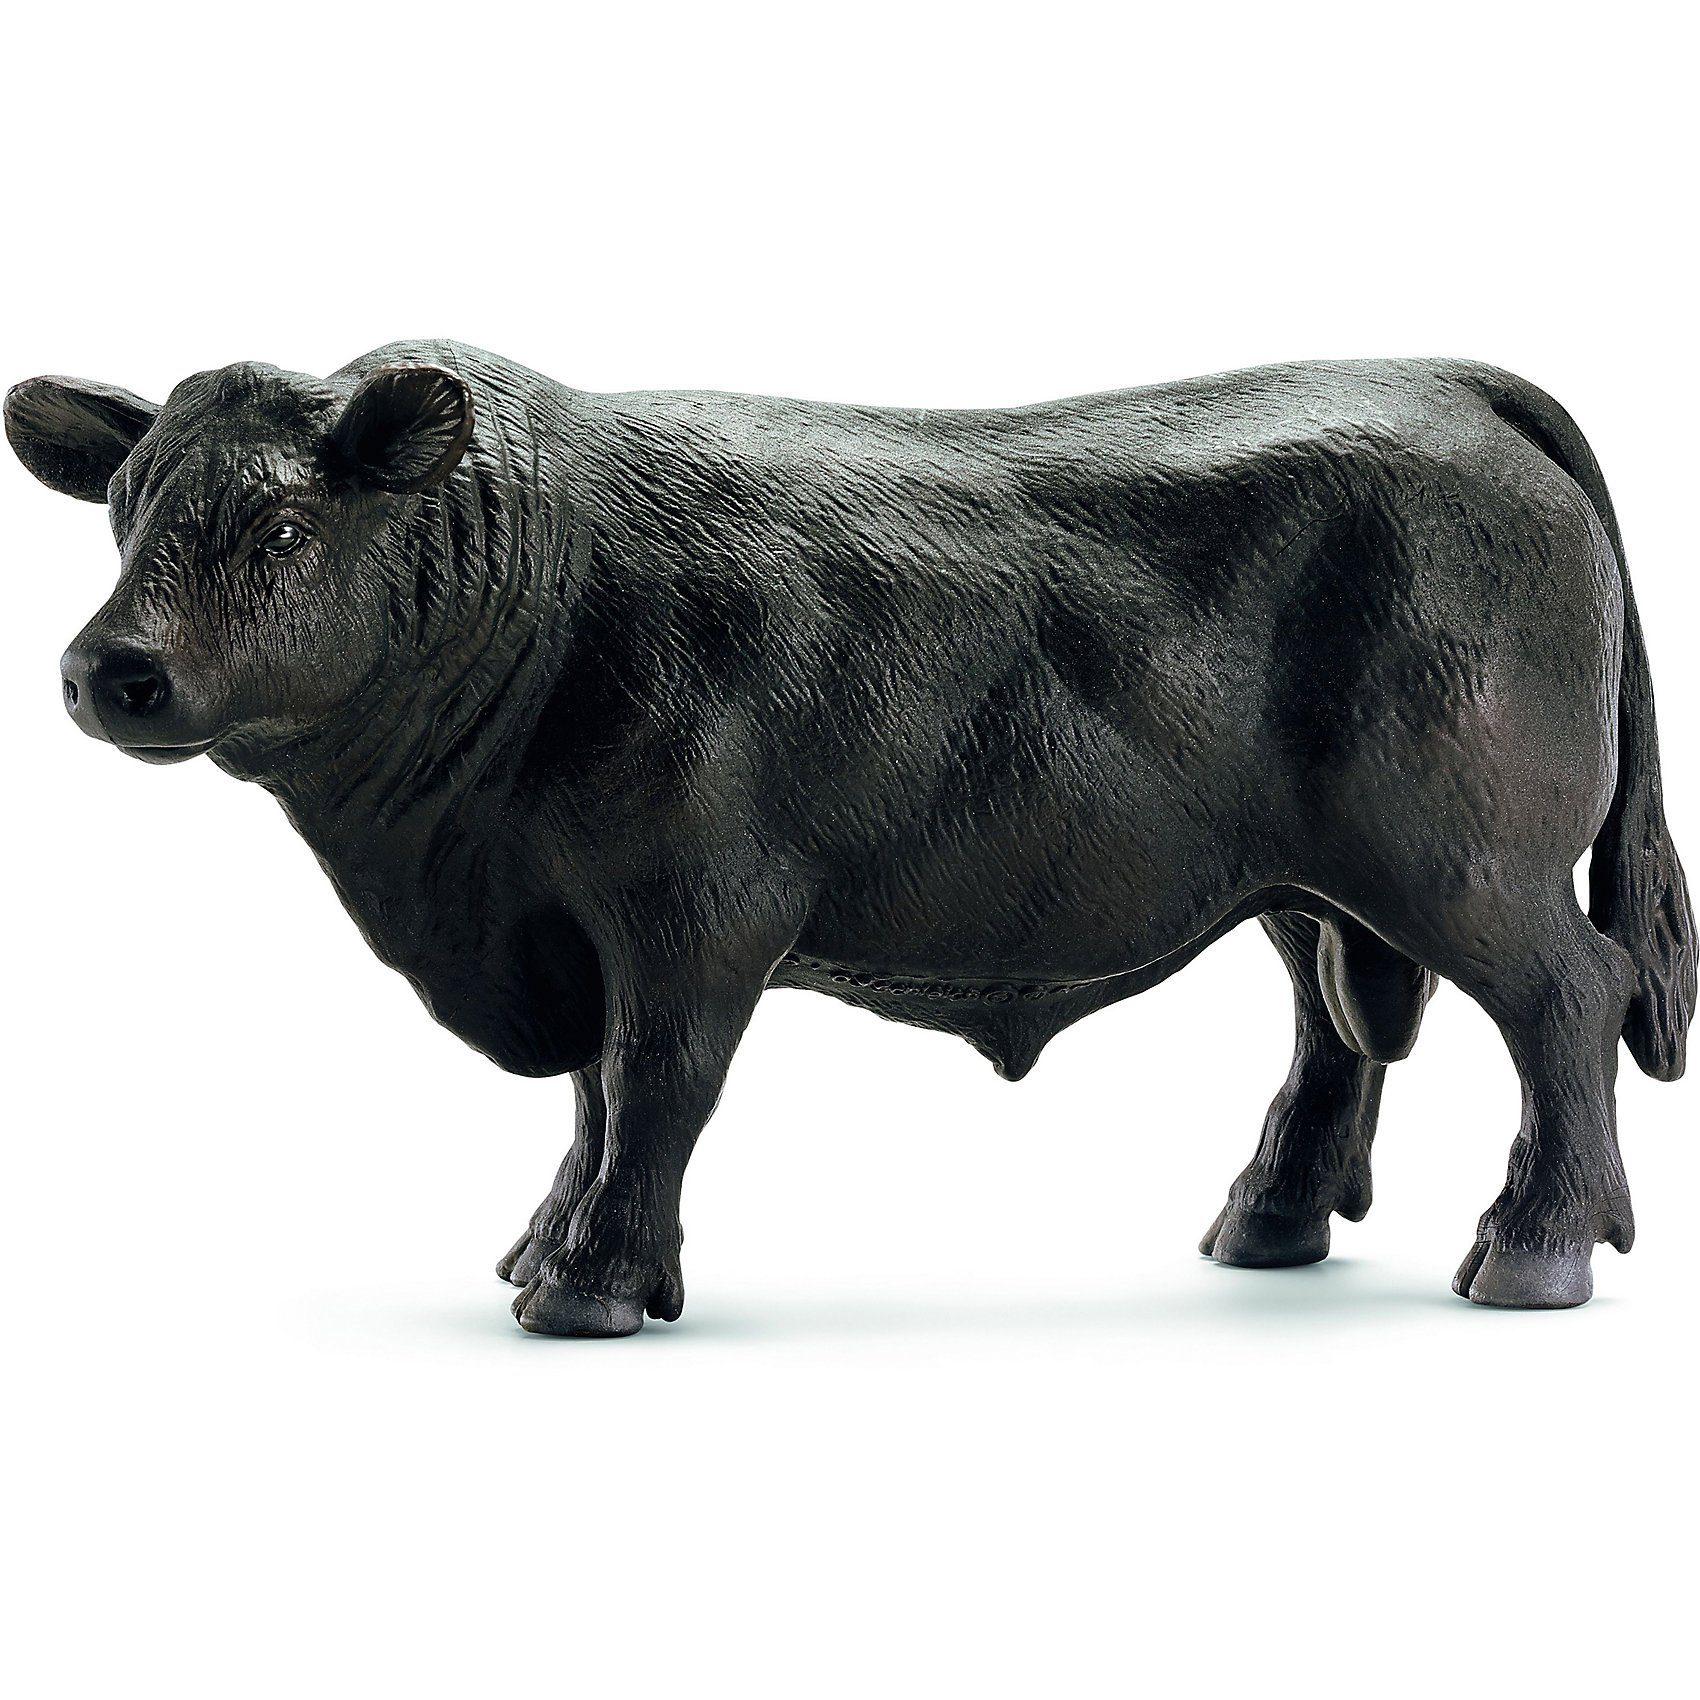 Schleich 13766 Farm World: Black Angus Bulle